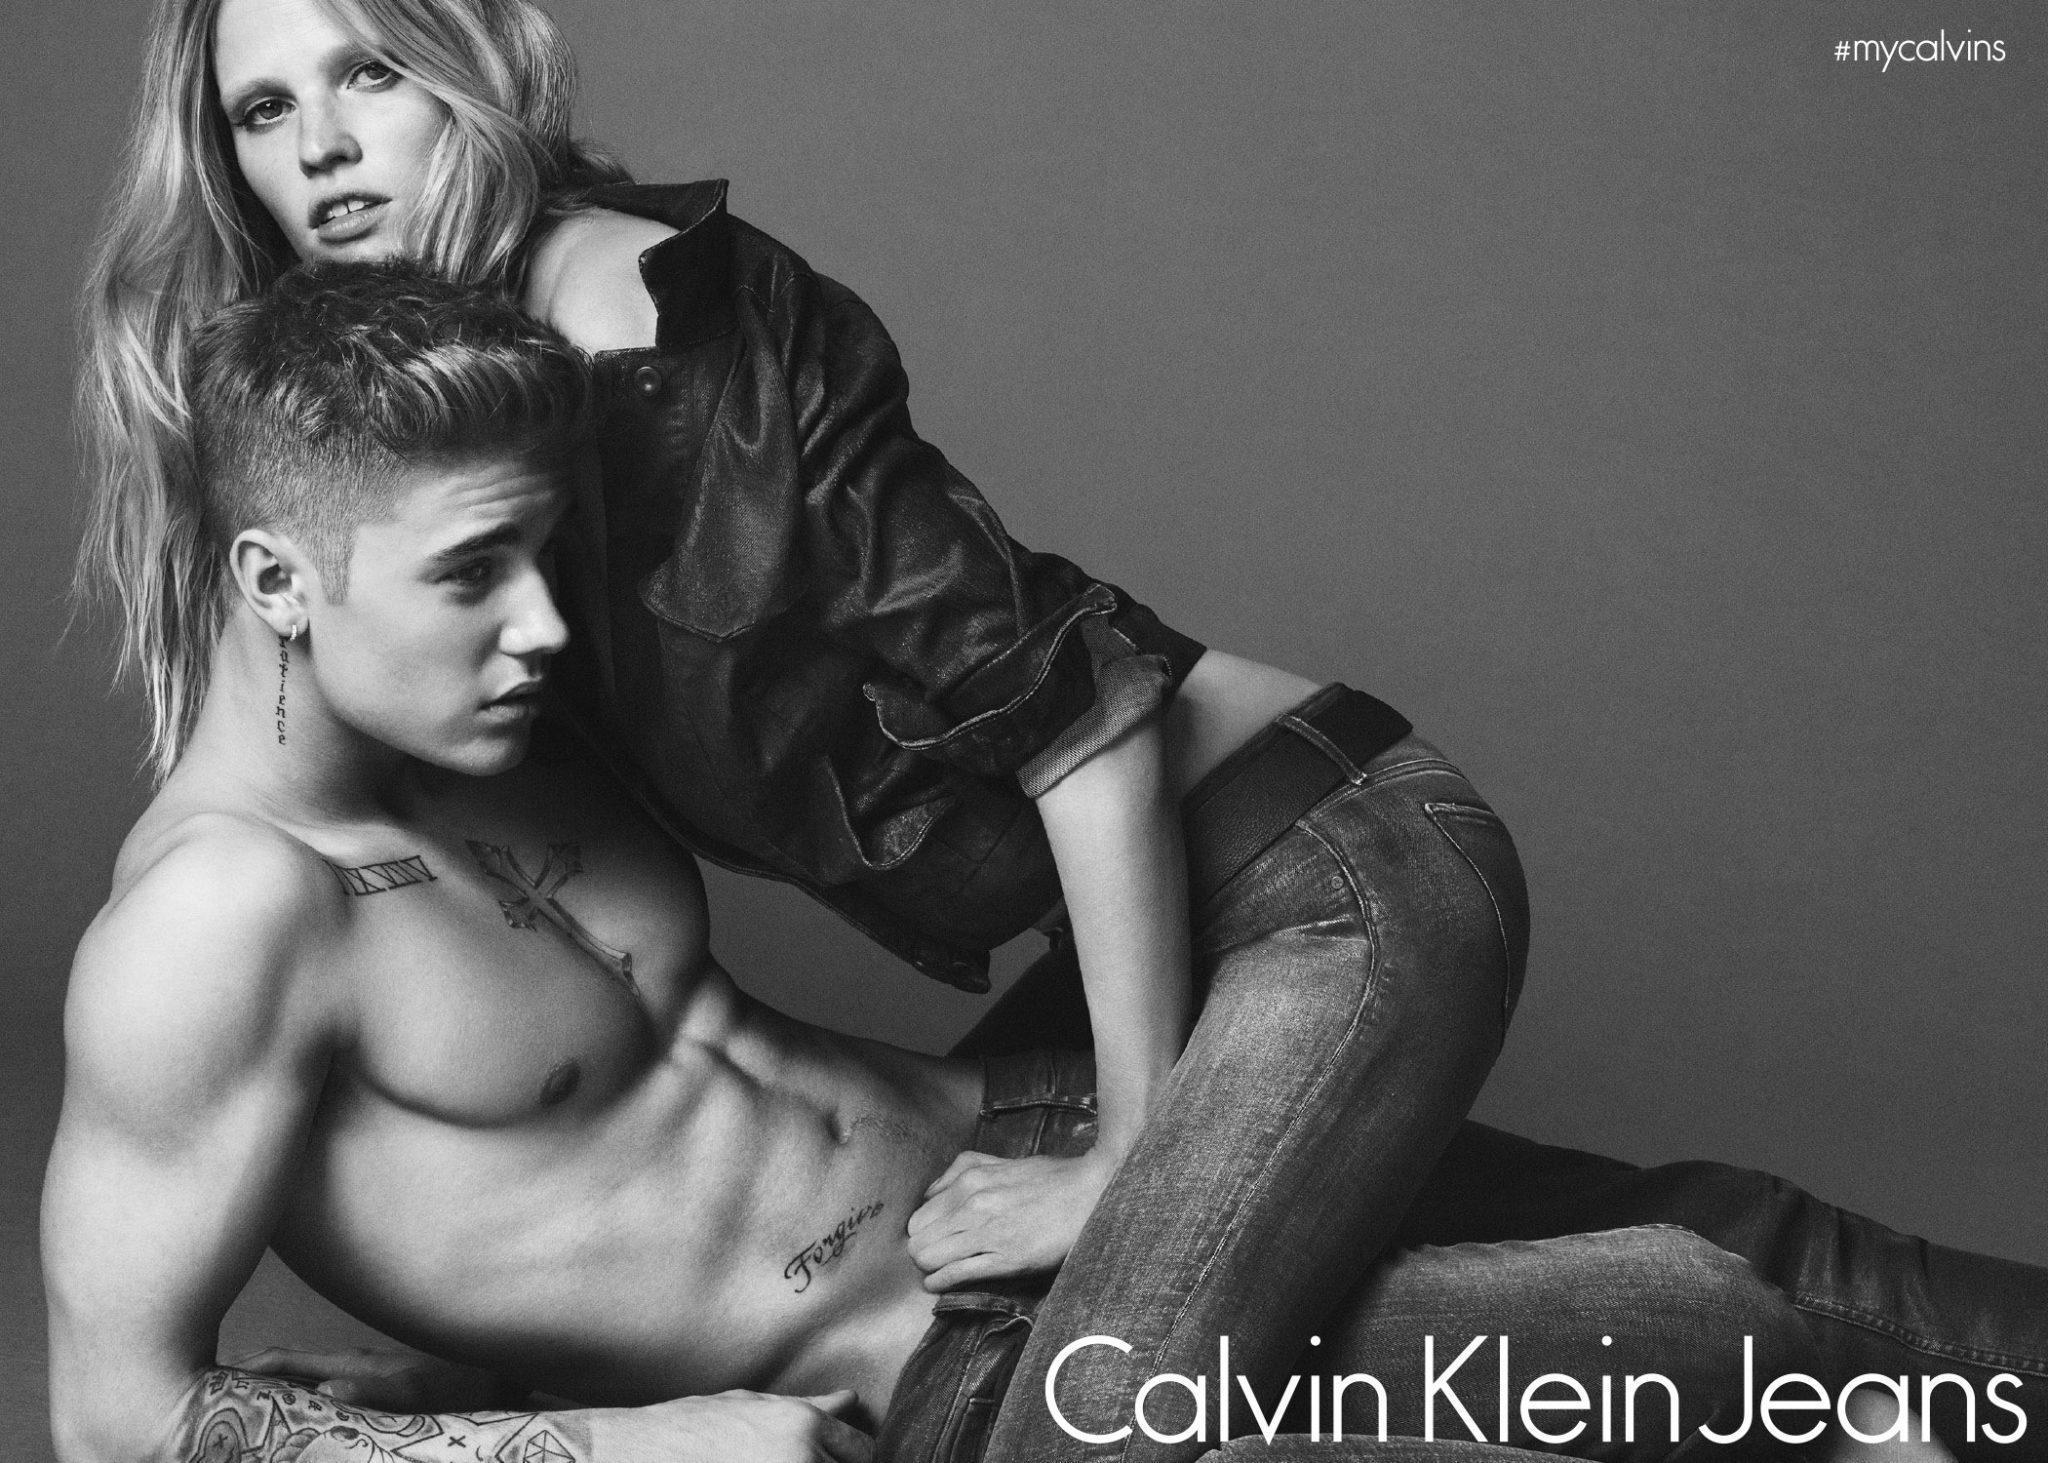 Justin Bieber a Lara Stone pro Calvin Klein. Zdroj: Oficiální FB a Instagram Calvin Klein